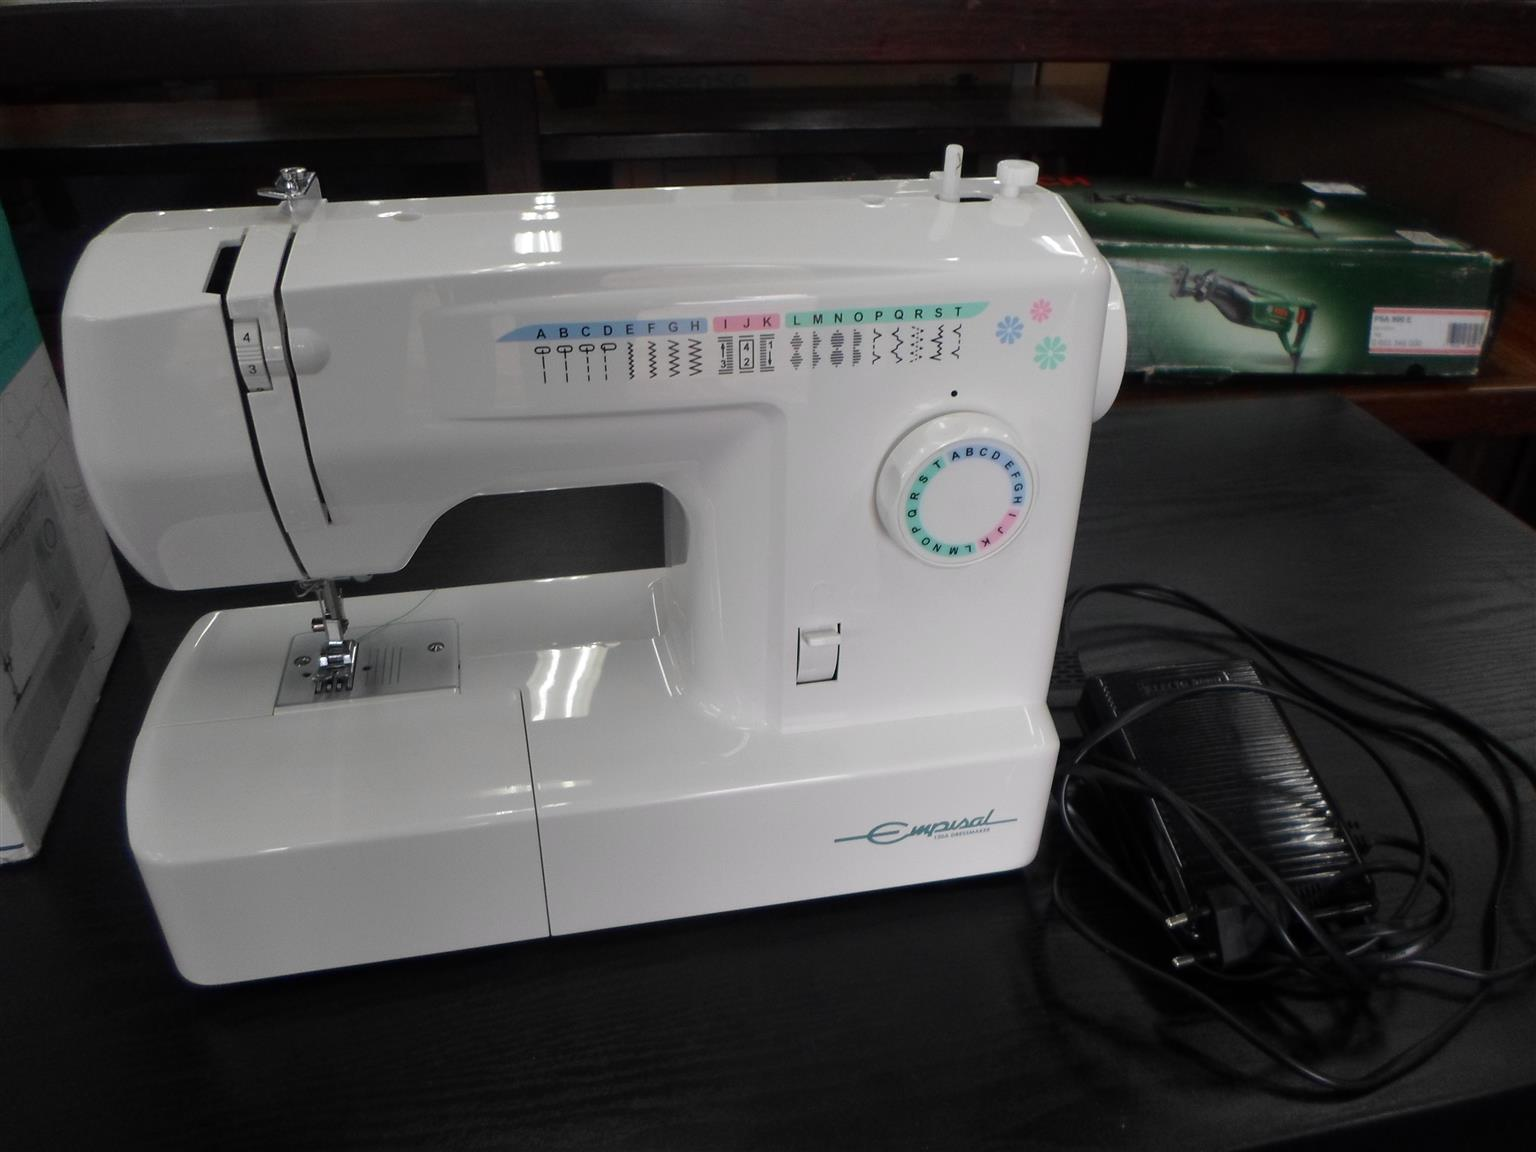 Empisal 120A Dressmaker Sewing Machine